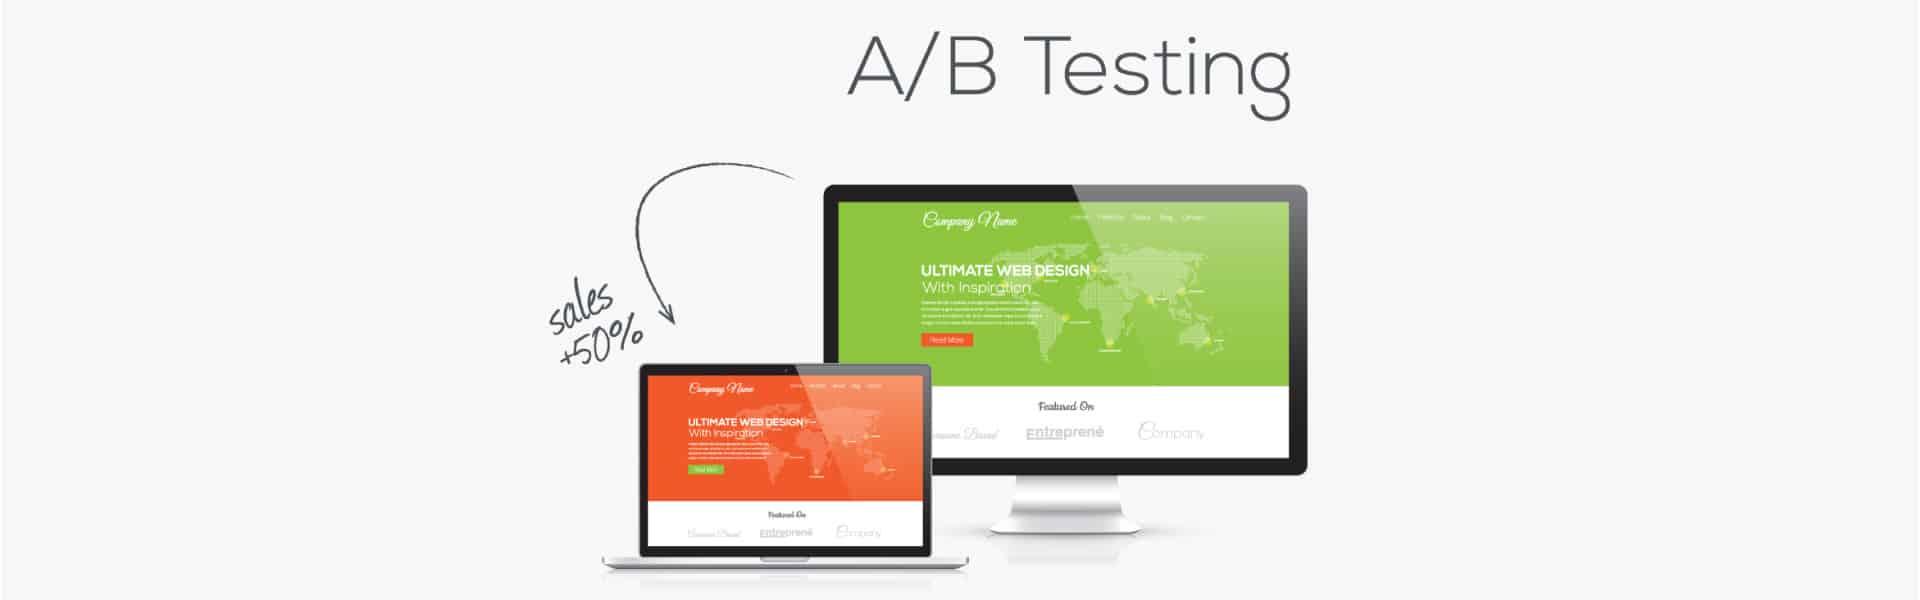 AB test sales